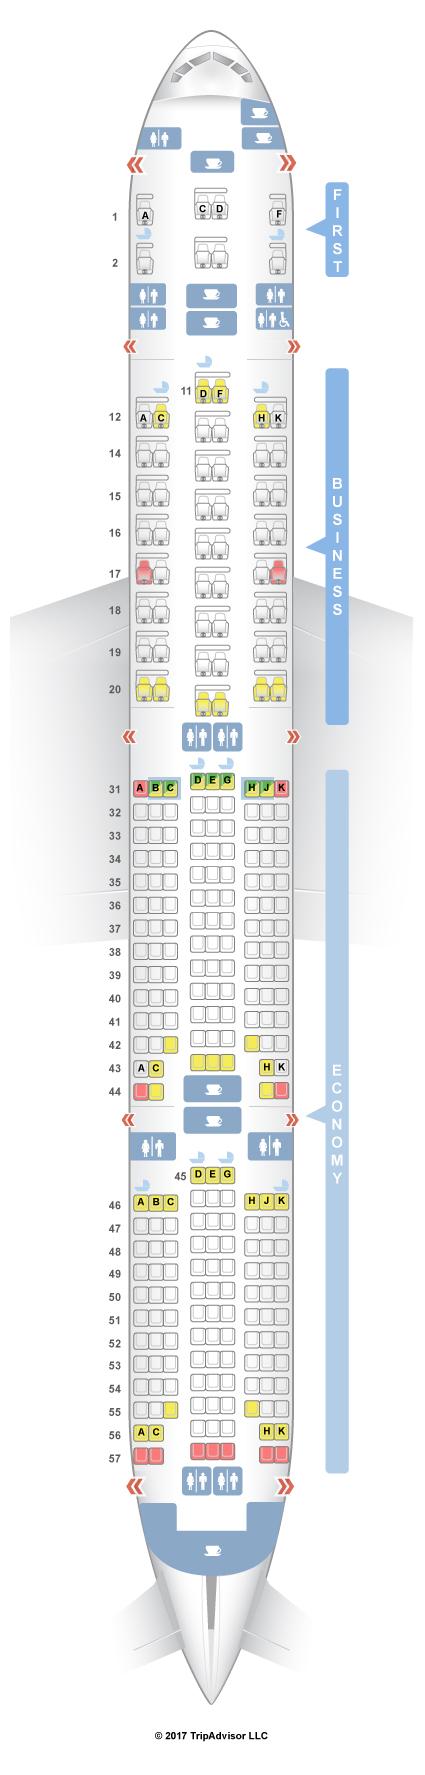 SeatGuru Seat Map Singapore Airlines Boeing 777-300 (773)